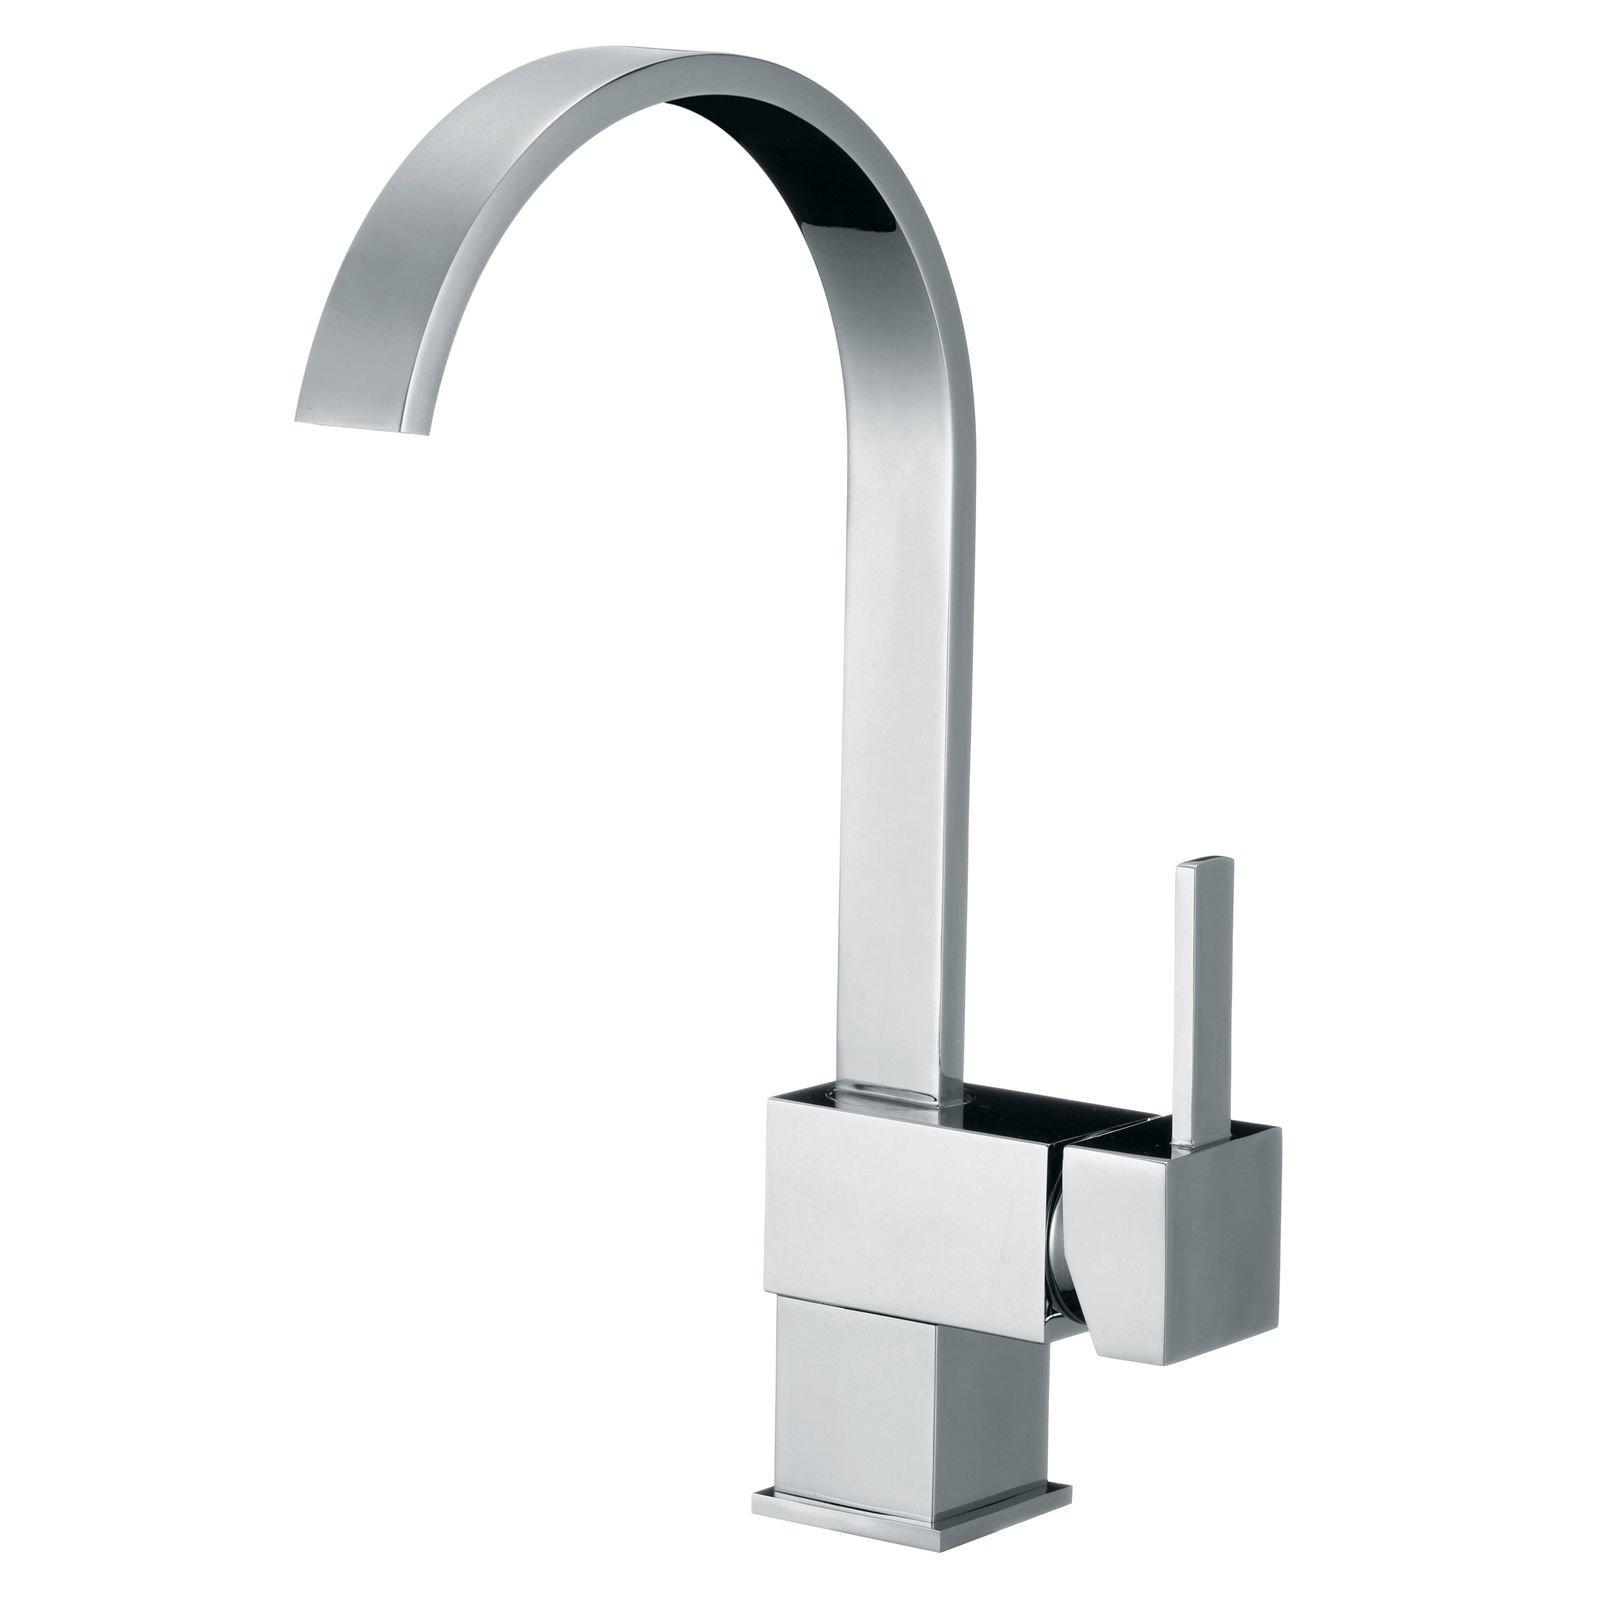 Yannlii Chrome Waterfall Kitchen Sink Faucet Vessel Faucet Centerset Widespread Modern Single Handle Single Hole Facuets Sprayer Lavatory Faucets Unique Designer Plumbing Fixtures Supply Lines Tub Shower Mixer Taps